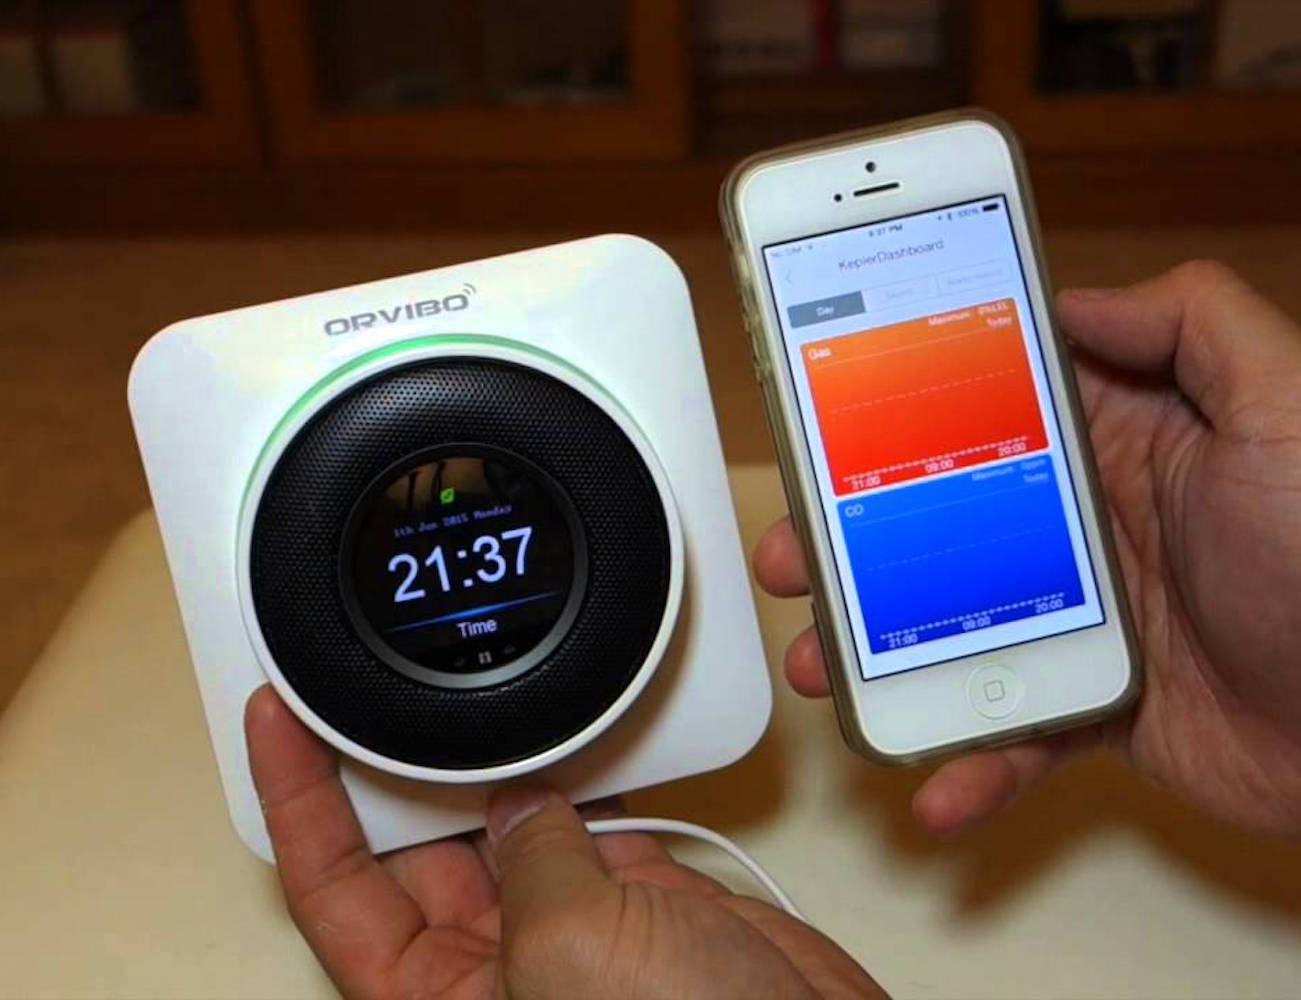 kepler-the-smart-home-gas-detector-by-orvibo-02